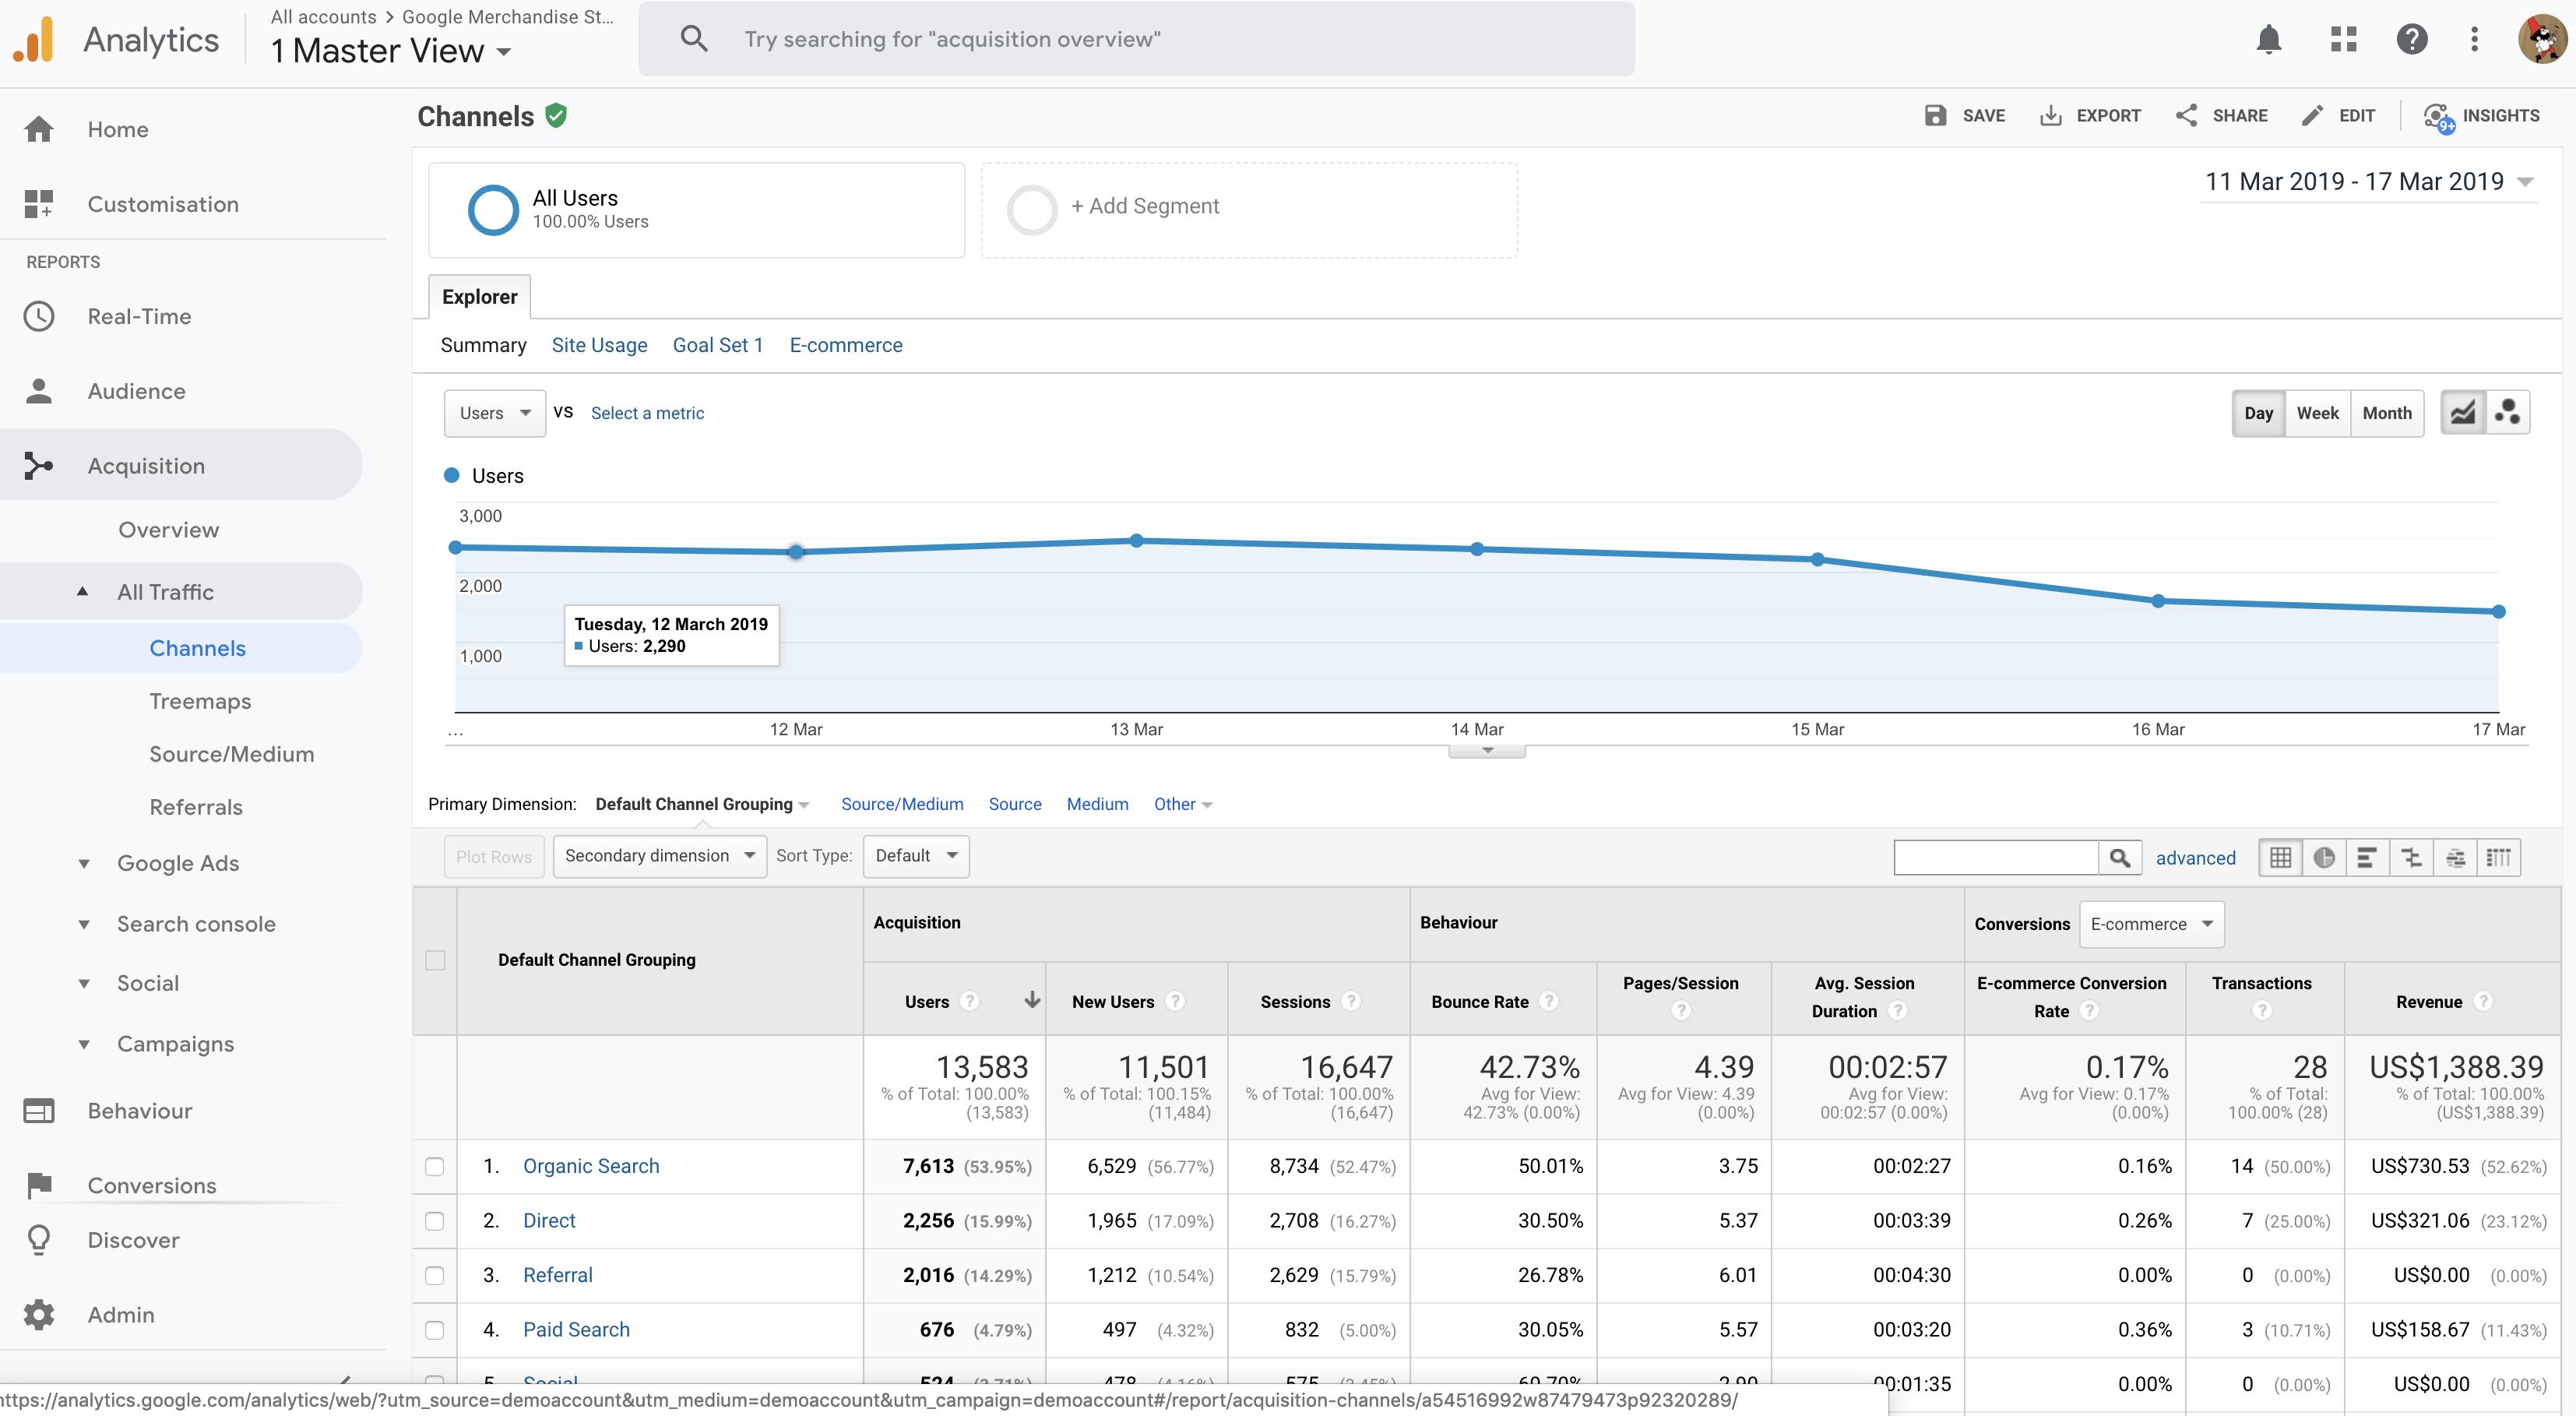 2 abra - acquisition _ all traffic _ channels-google analytics-kosarertek